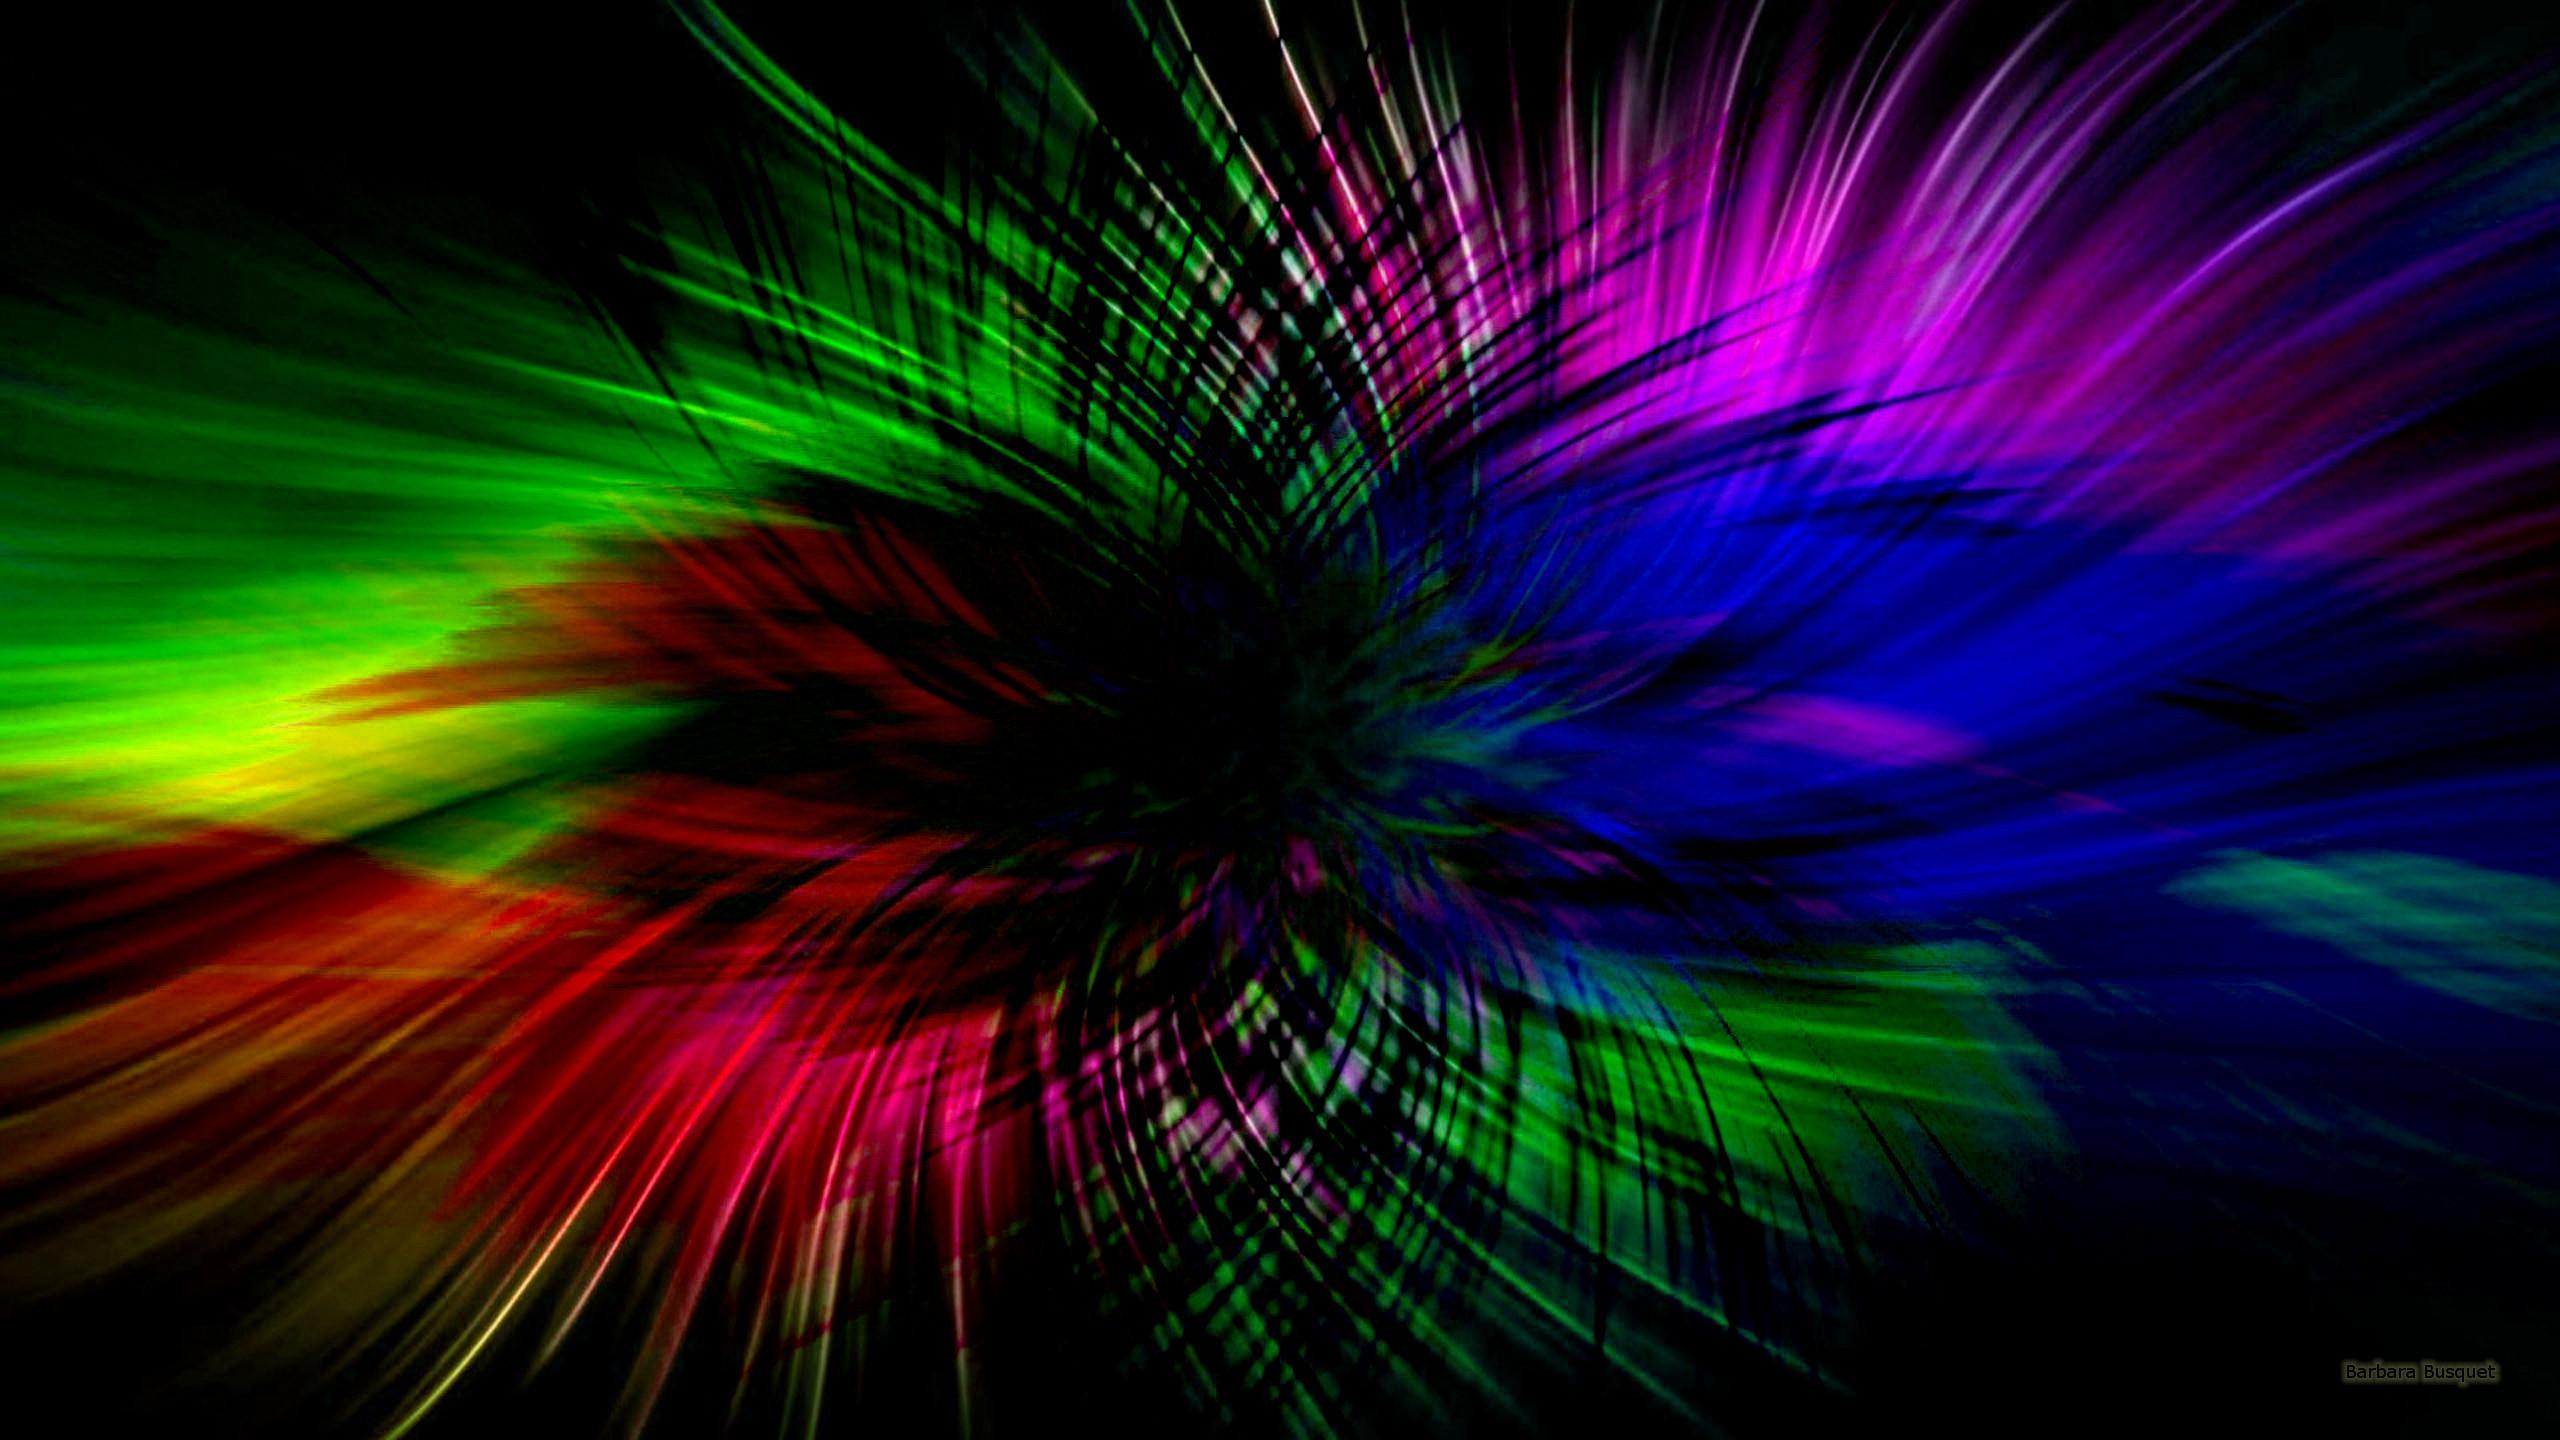 wallpaper abstract colour hd - photo #37